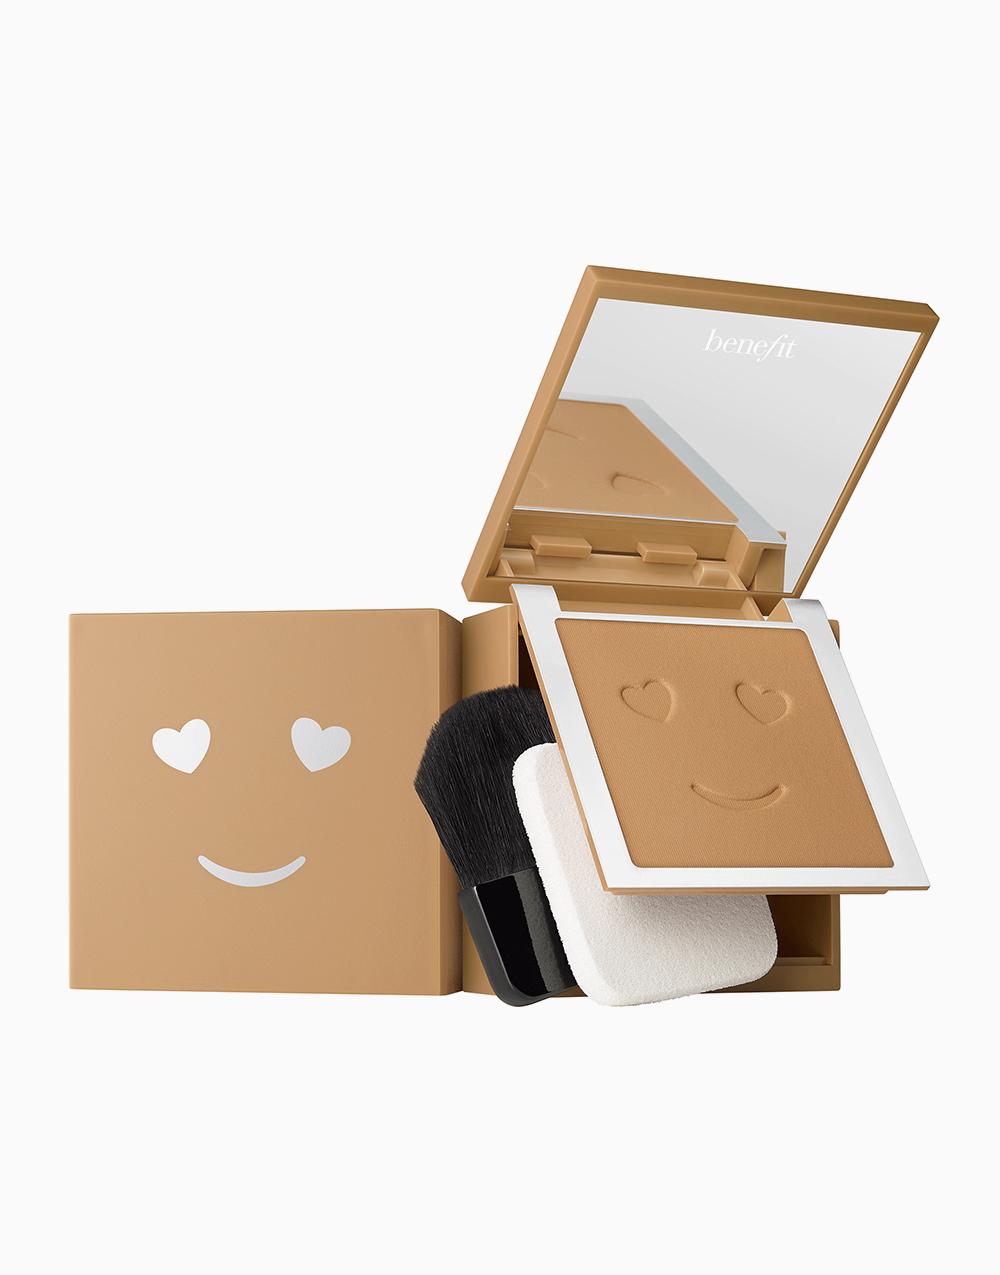 Hello Happy Velvet Powder Foundation by Benefit | Shade 08